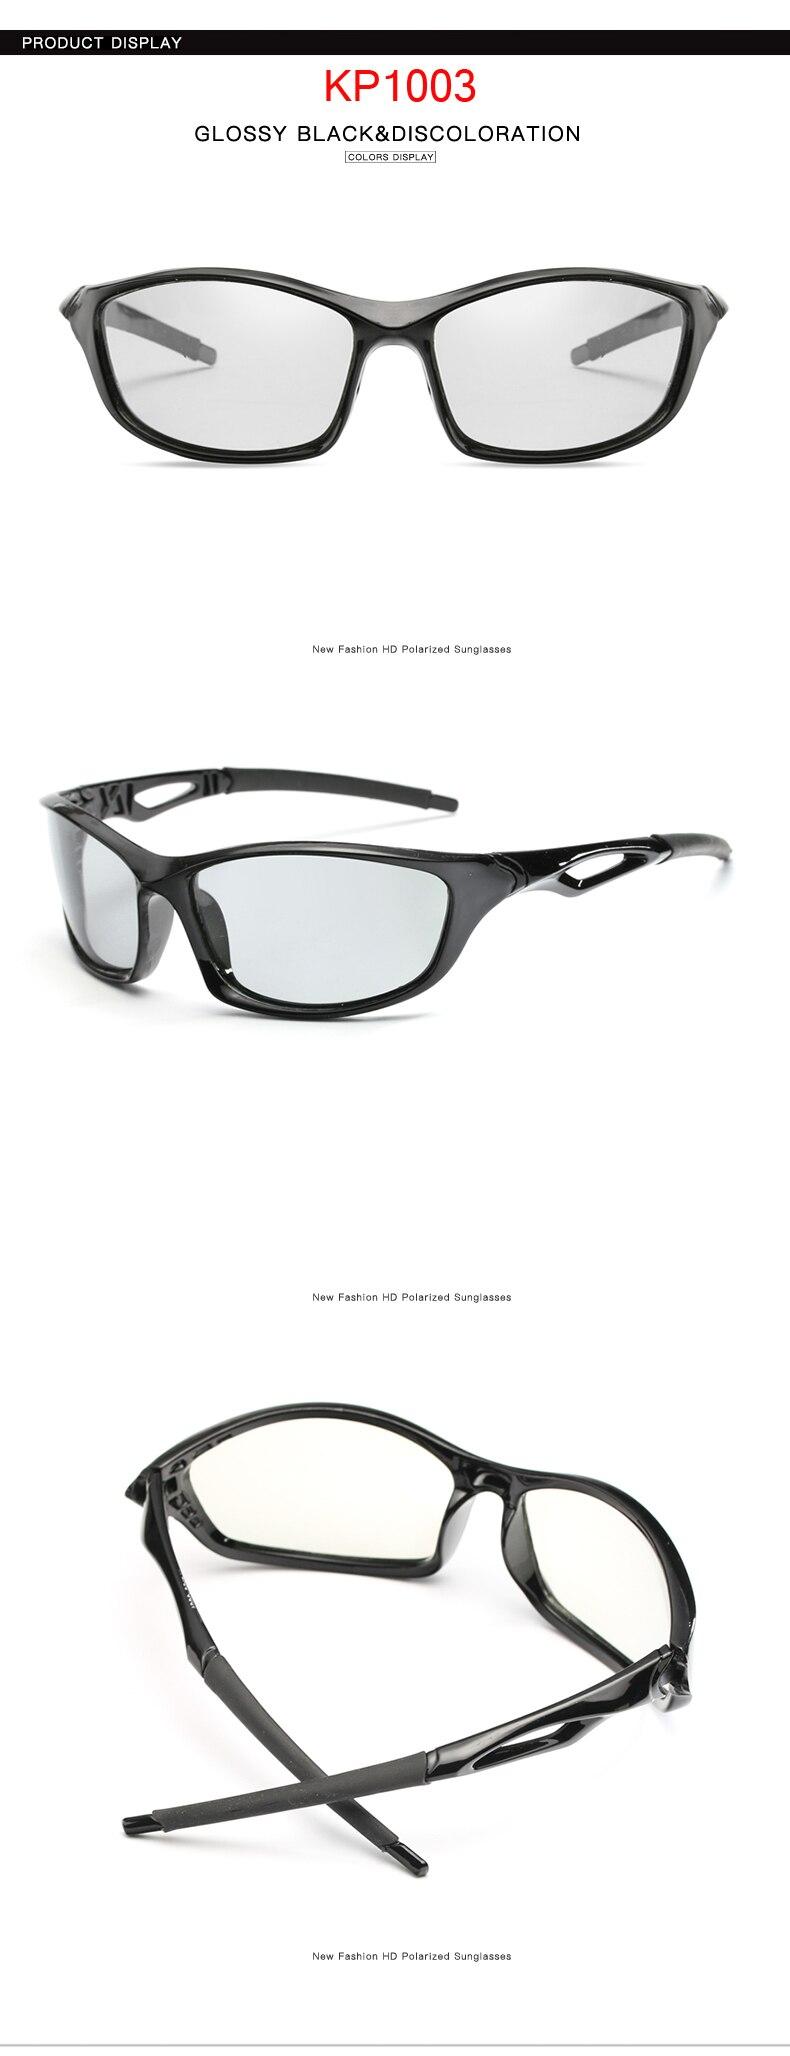 6696555a12 LongKeeper 2018 Photochromic Sunglasses Classic Men Outdoor UV400 Black  Frame Sun Glasses Women HD Polarized EyewearUSD 6.75 piece